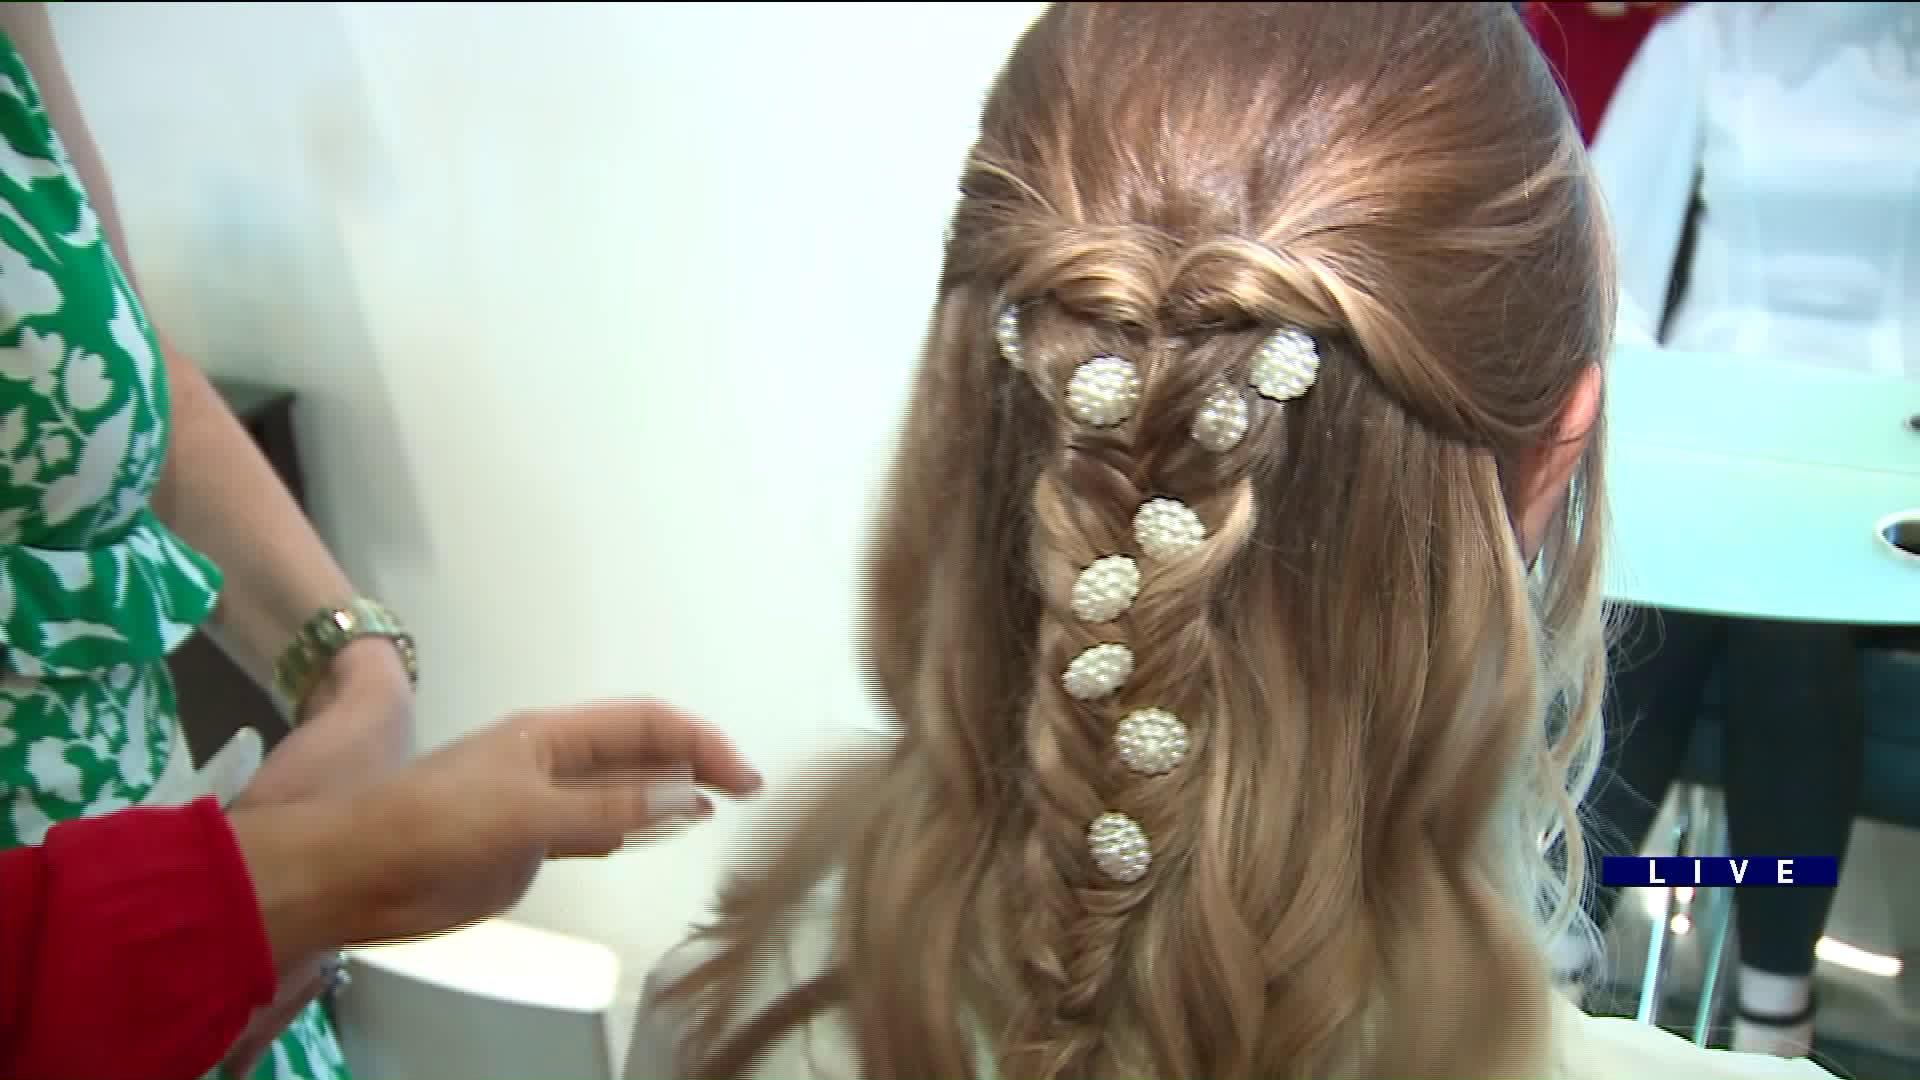 Around Town talks Summer hair trends at Bentley Hair & Beauty